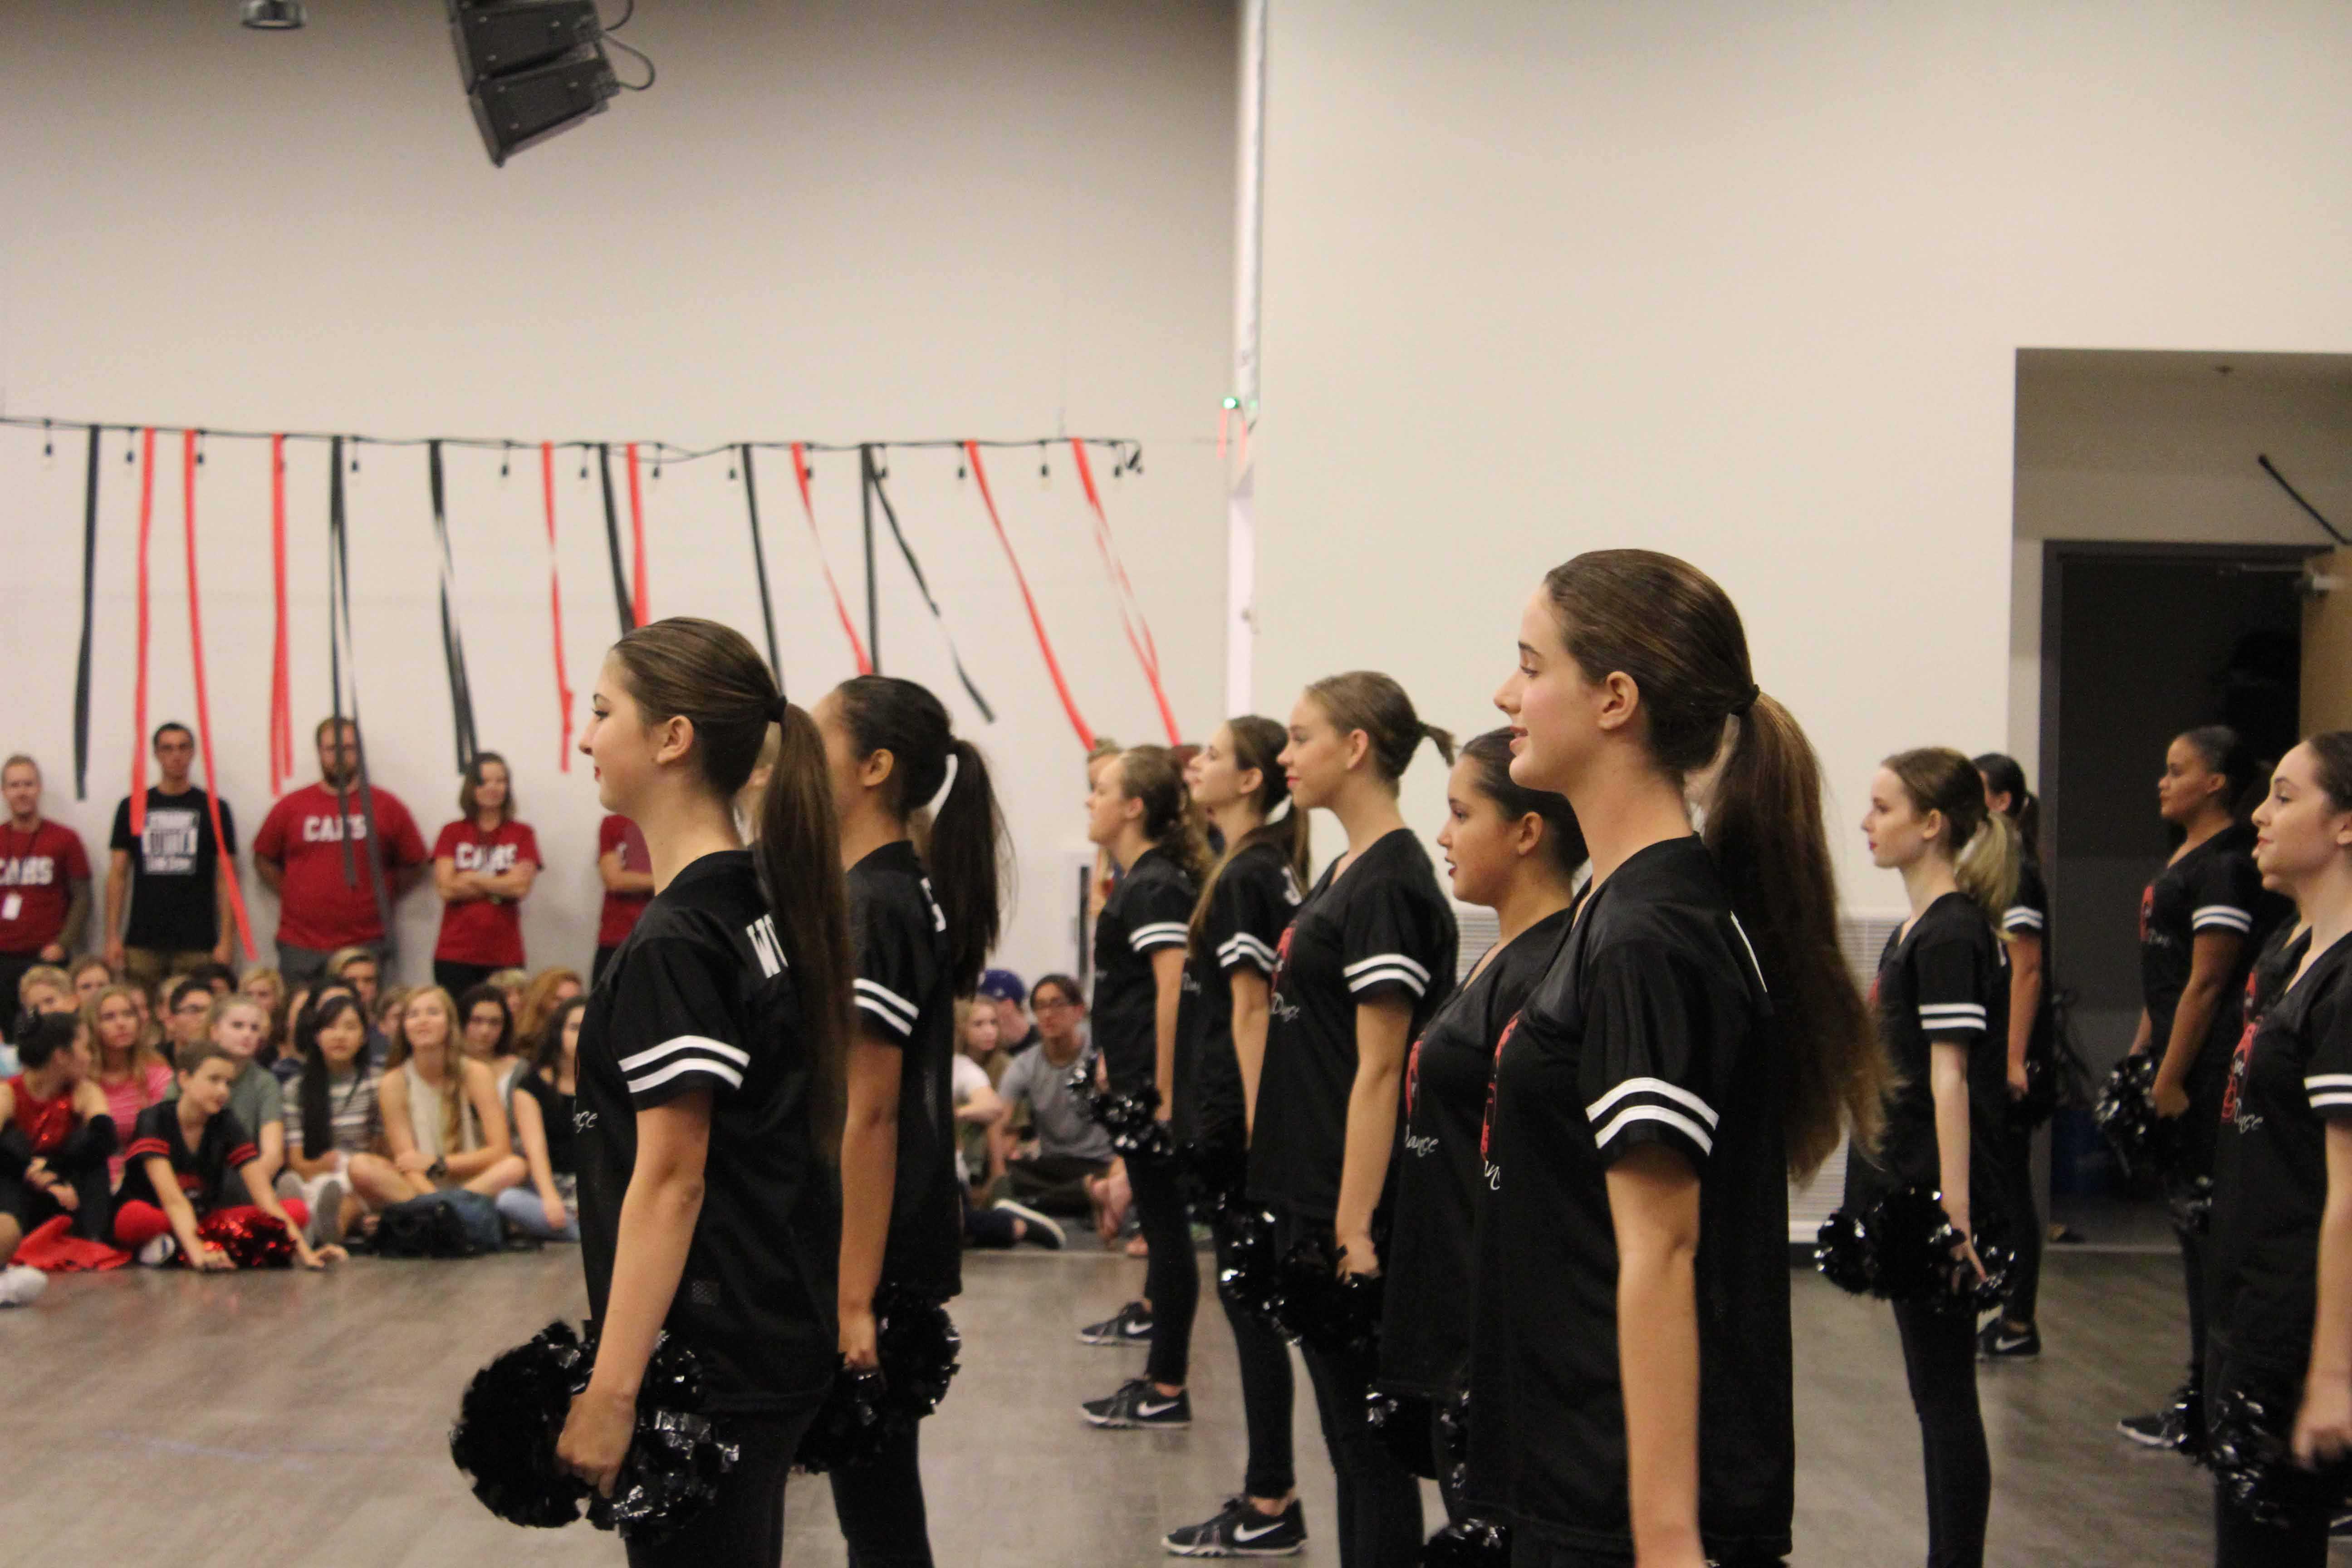 JV+Dance+Troupe+presents+its+routine.+Photo+taken+by+Anastasia+Reimann.+